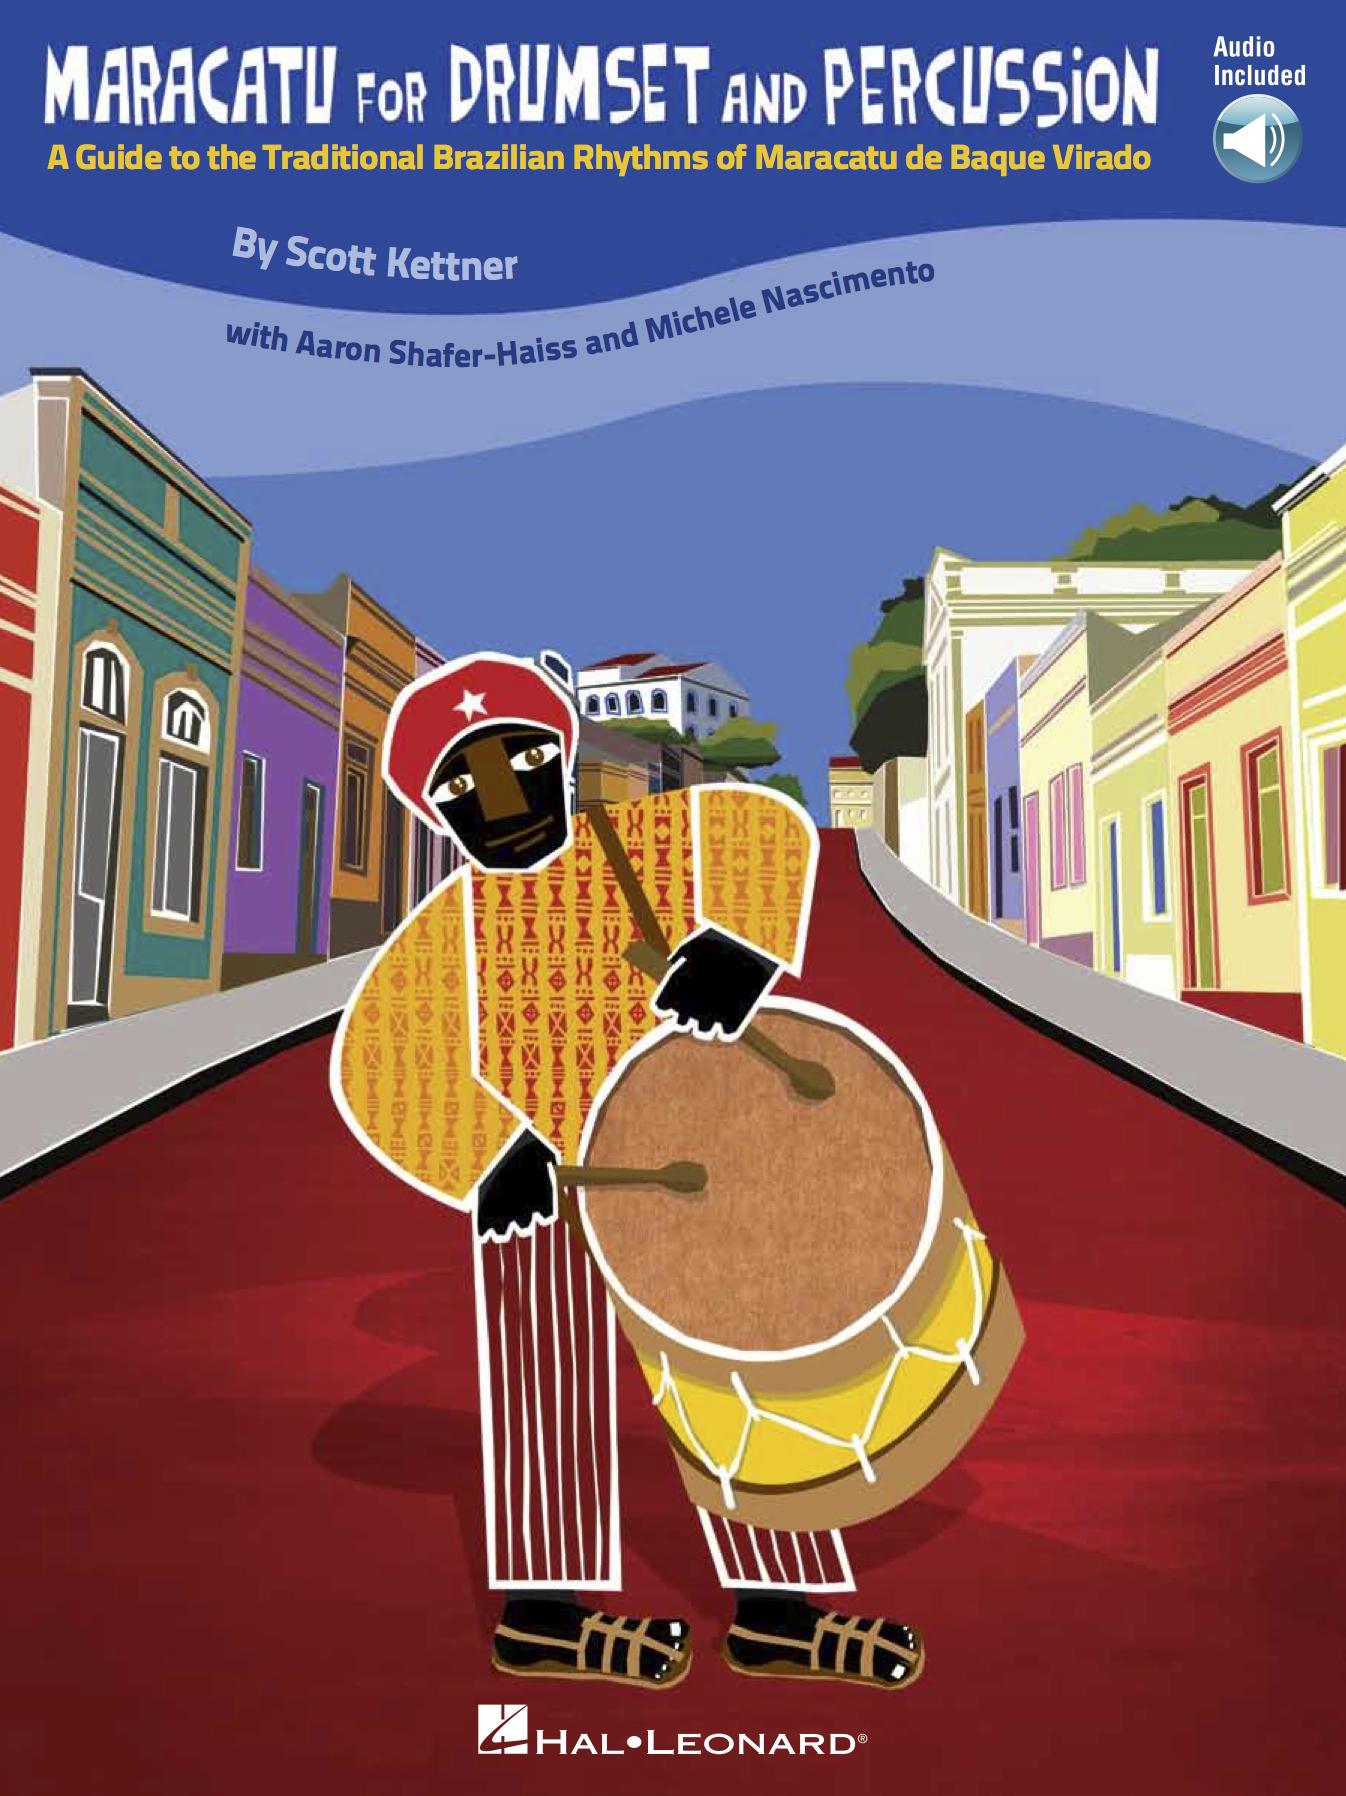 Instructional book by Scott Kettner - 2013